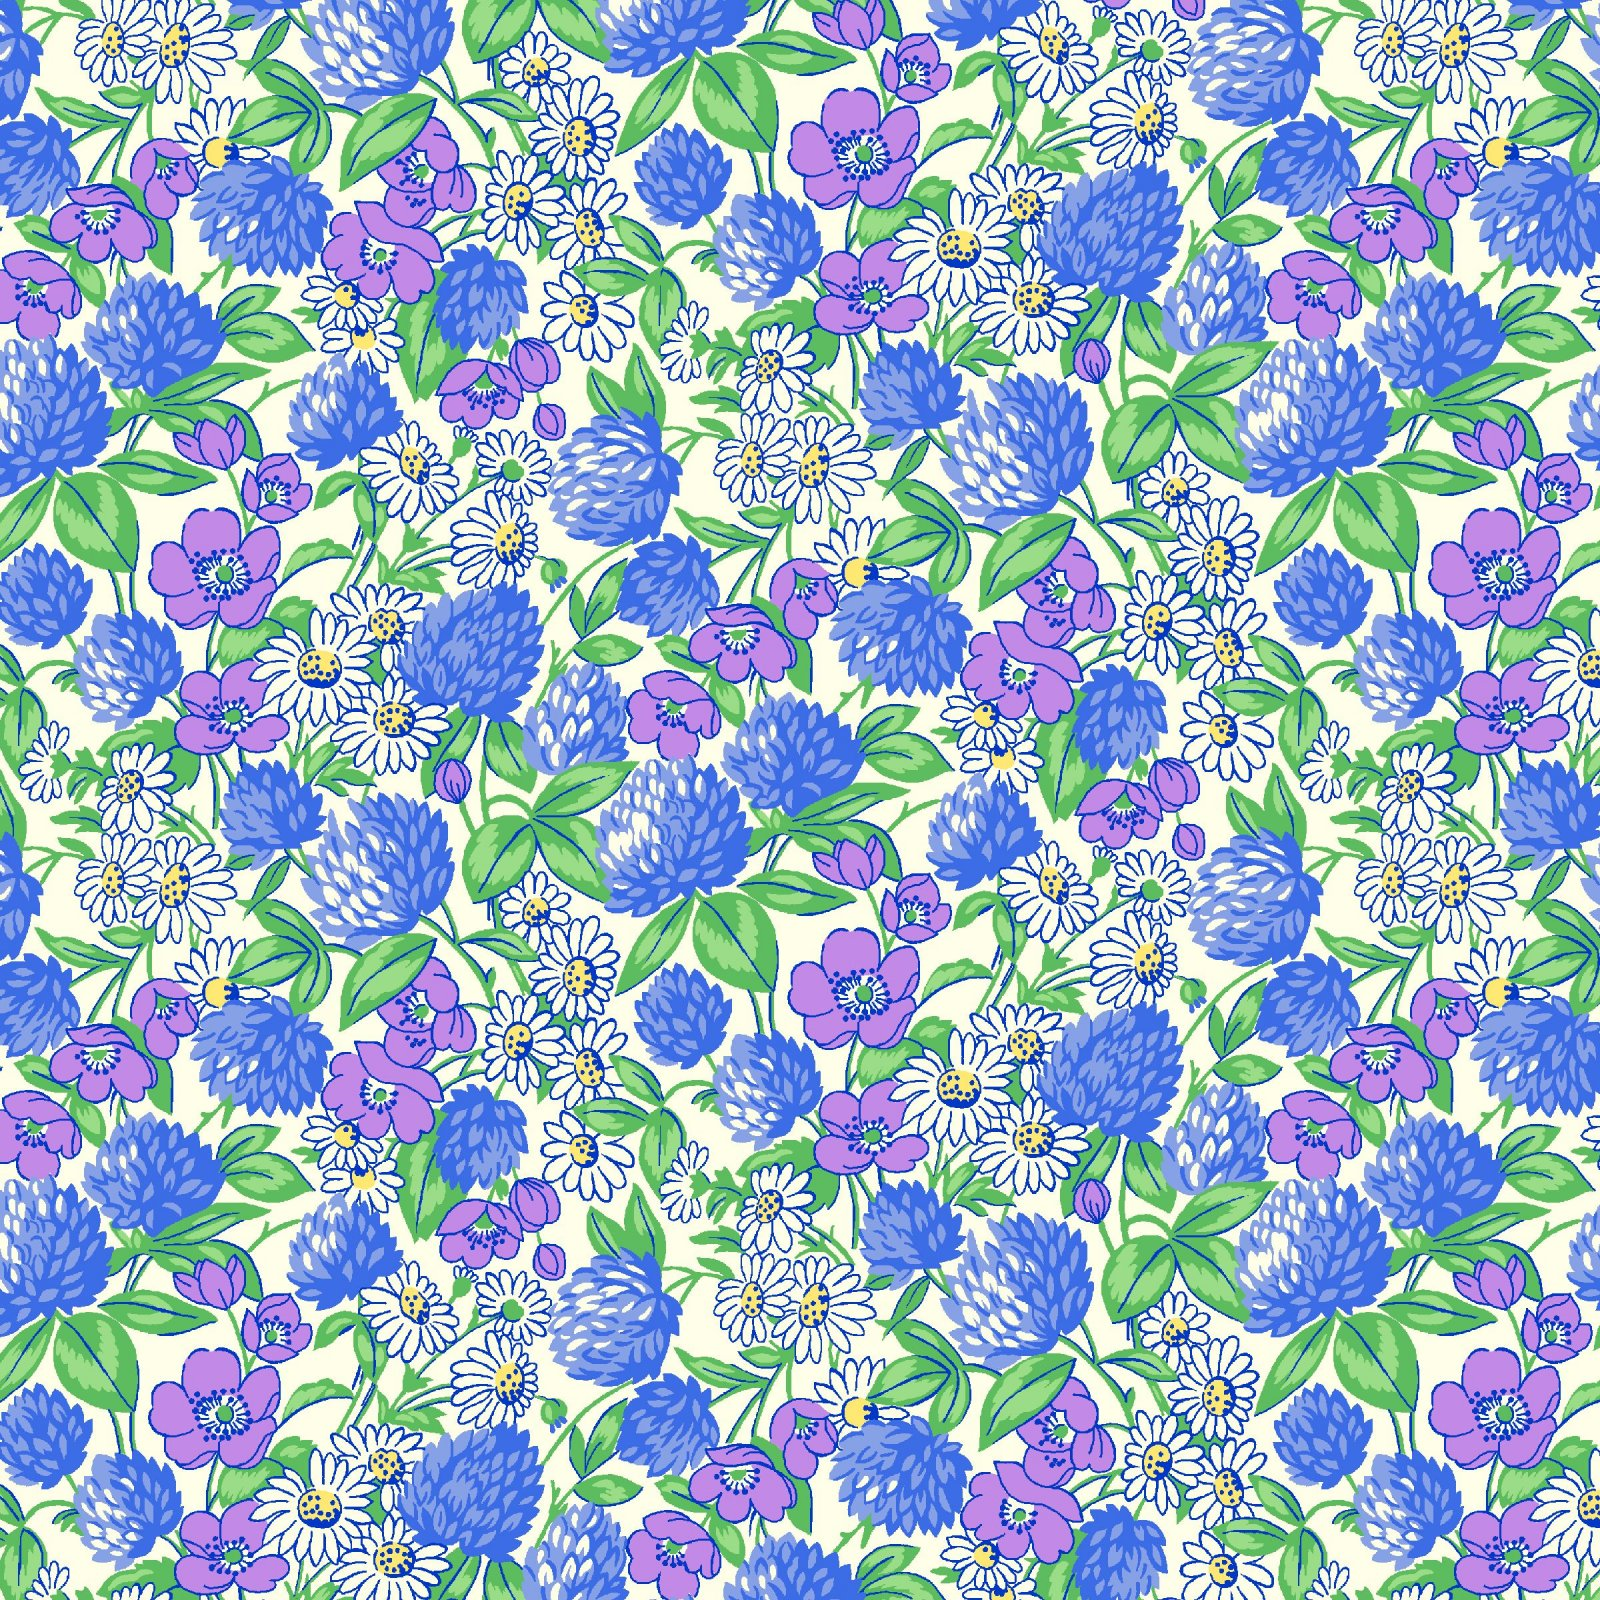 HG-Nana Mae V 9687-1 Blue - Clover and Daisies